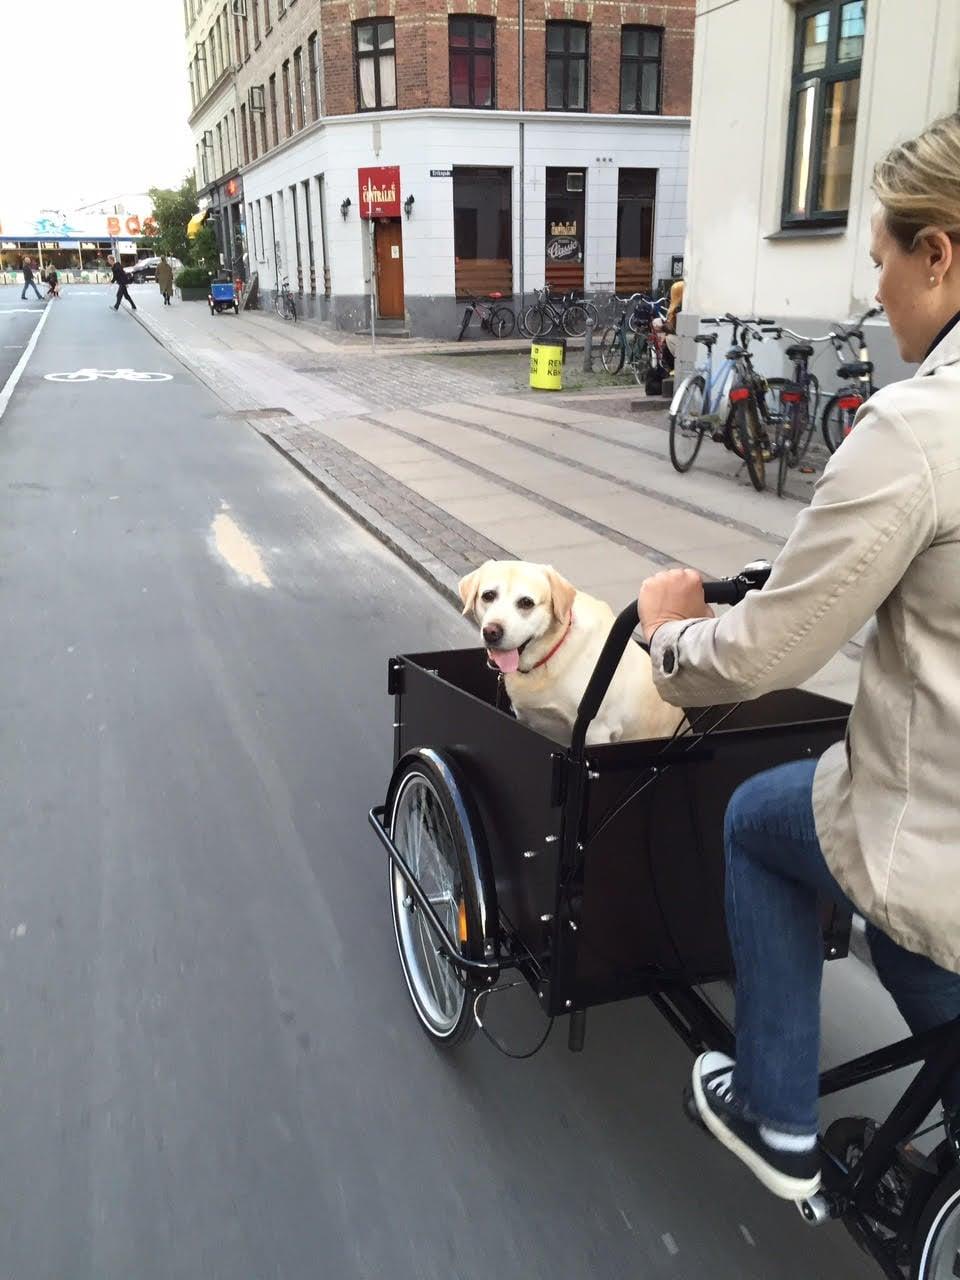 My friend's super-cute dog is enjoying the ride!